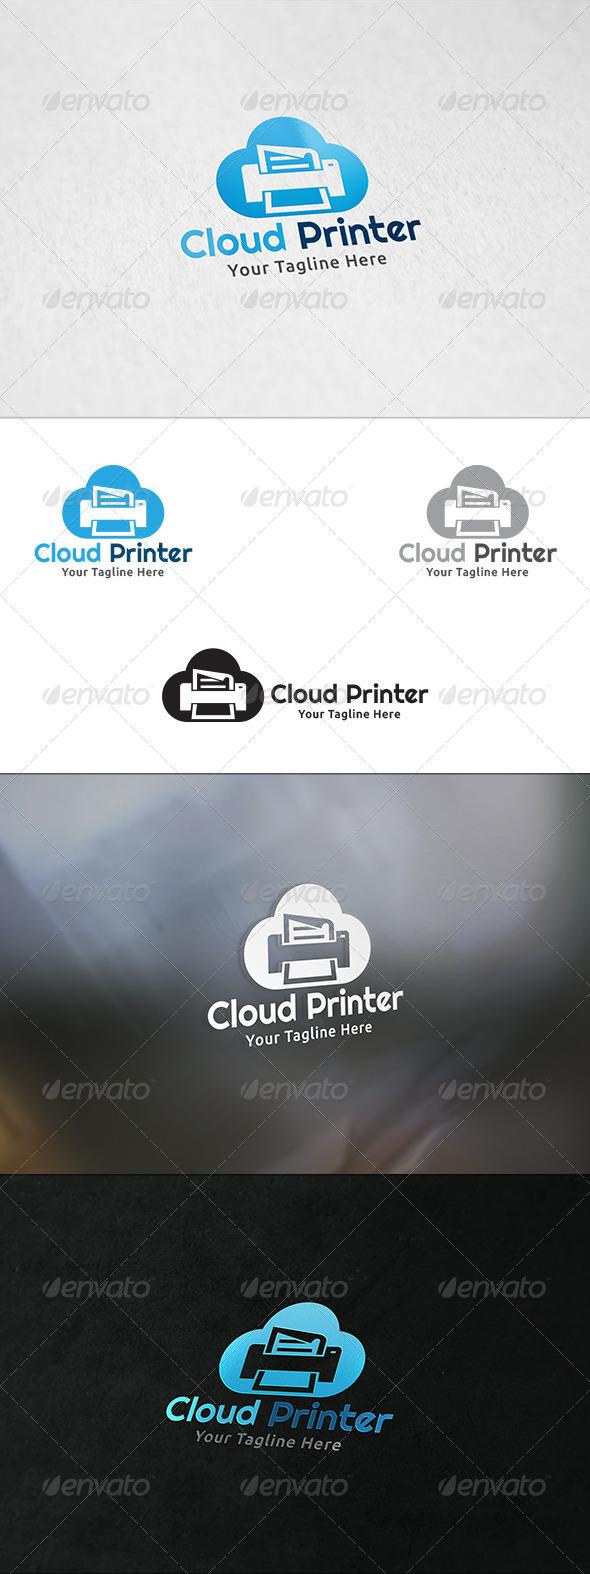 GraphicRiver Cloud Printer Logo Template 8351229